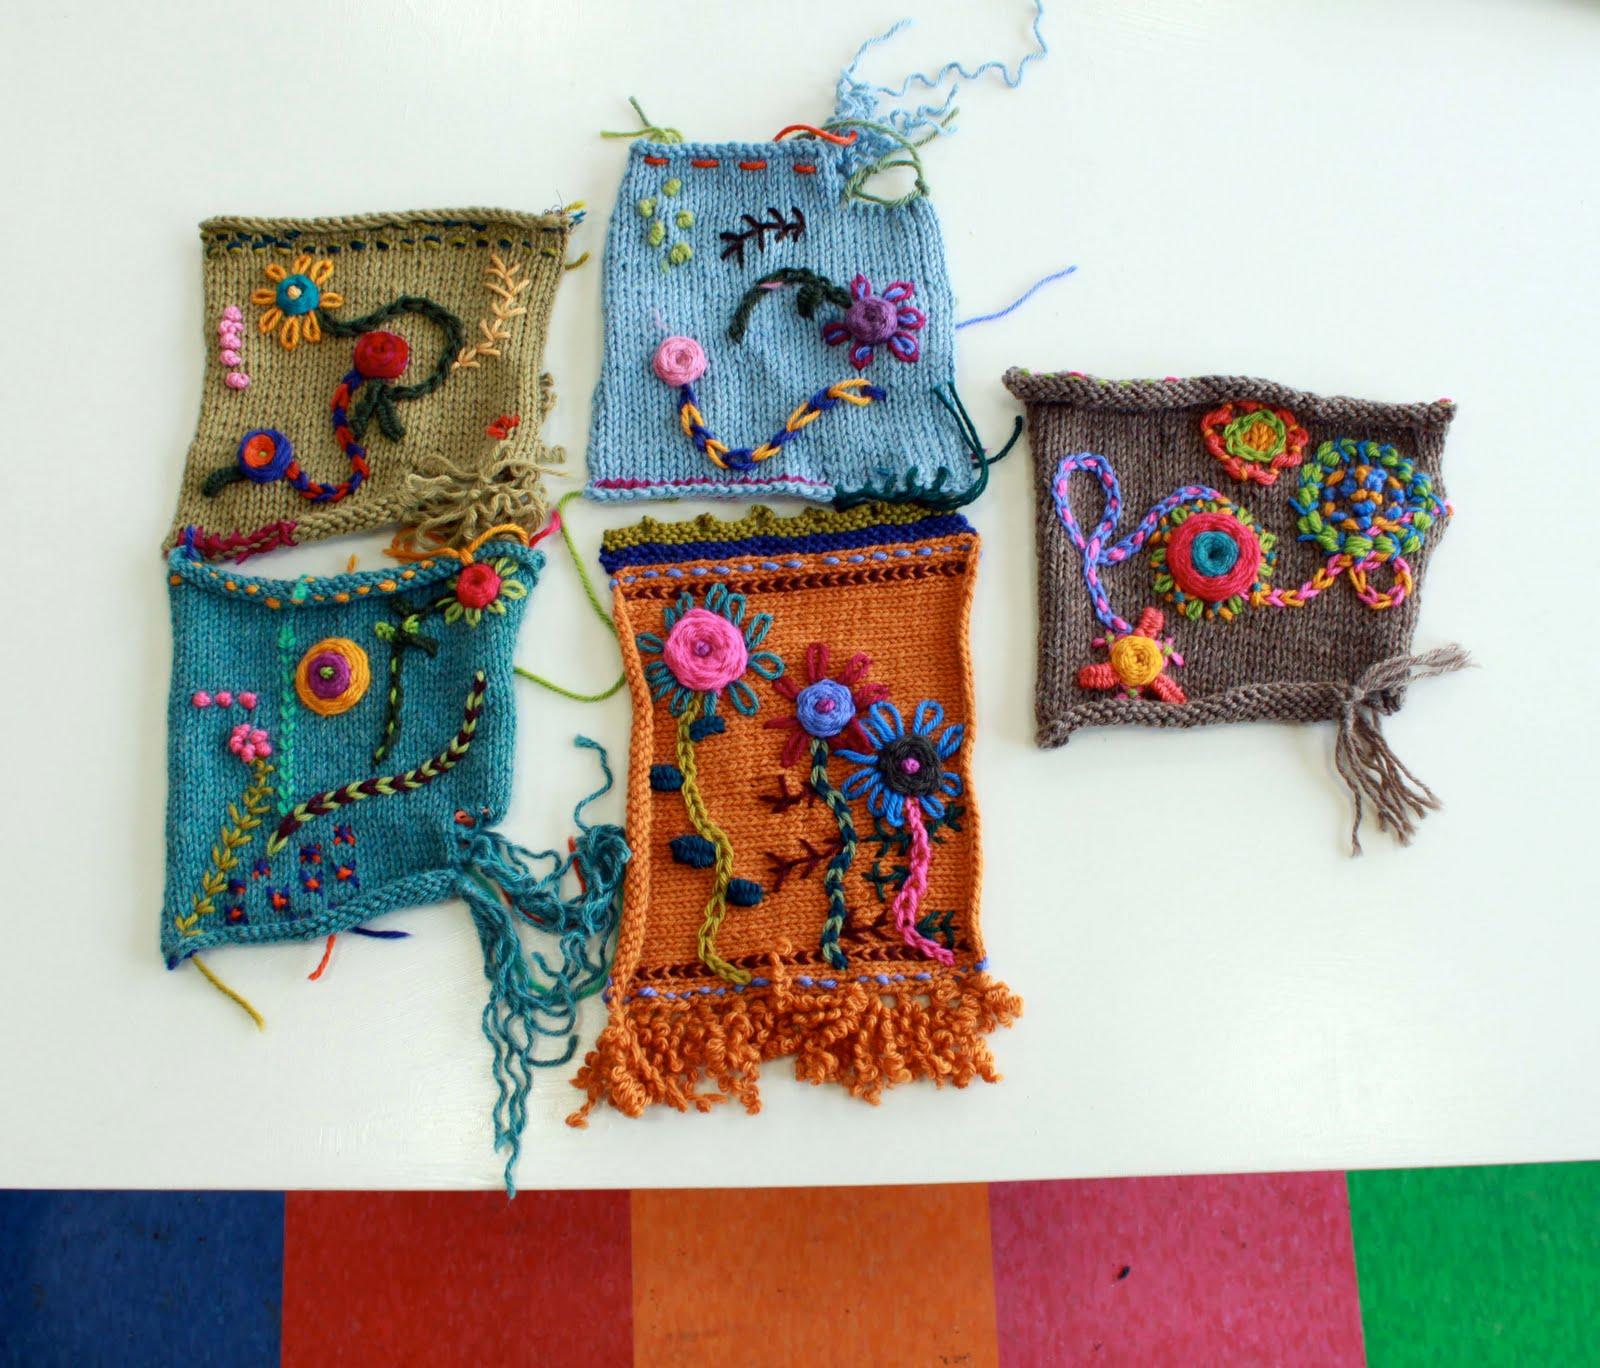 Knitting Embroidery Lessons : Kristin nicholas designs knitting patterns